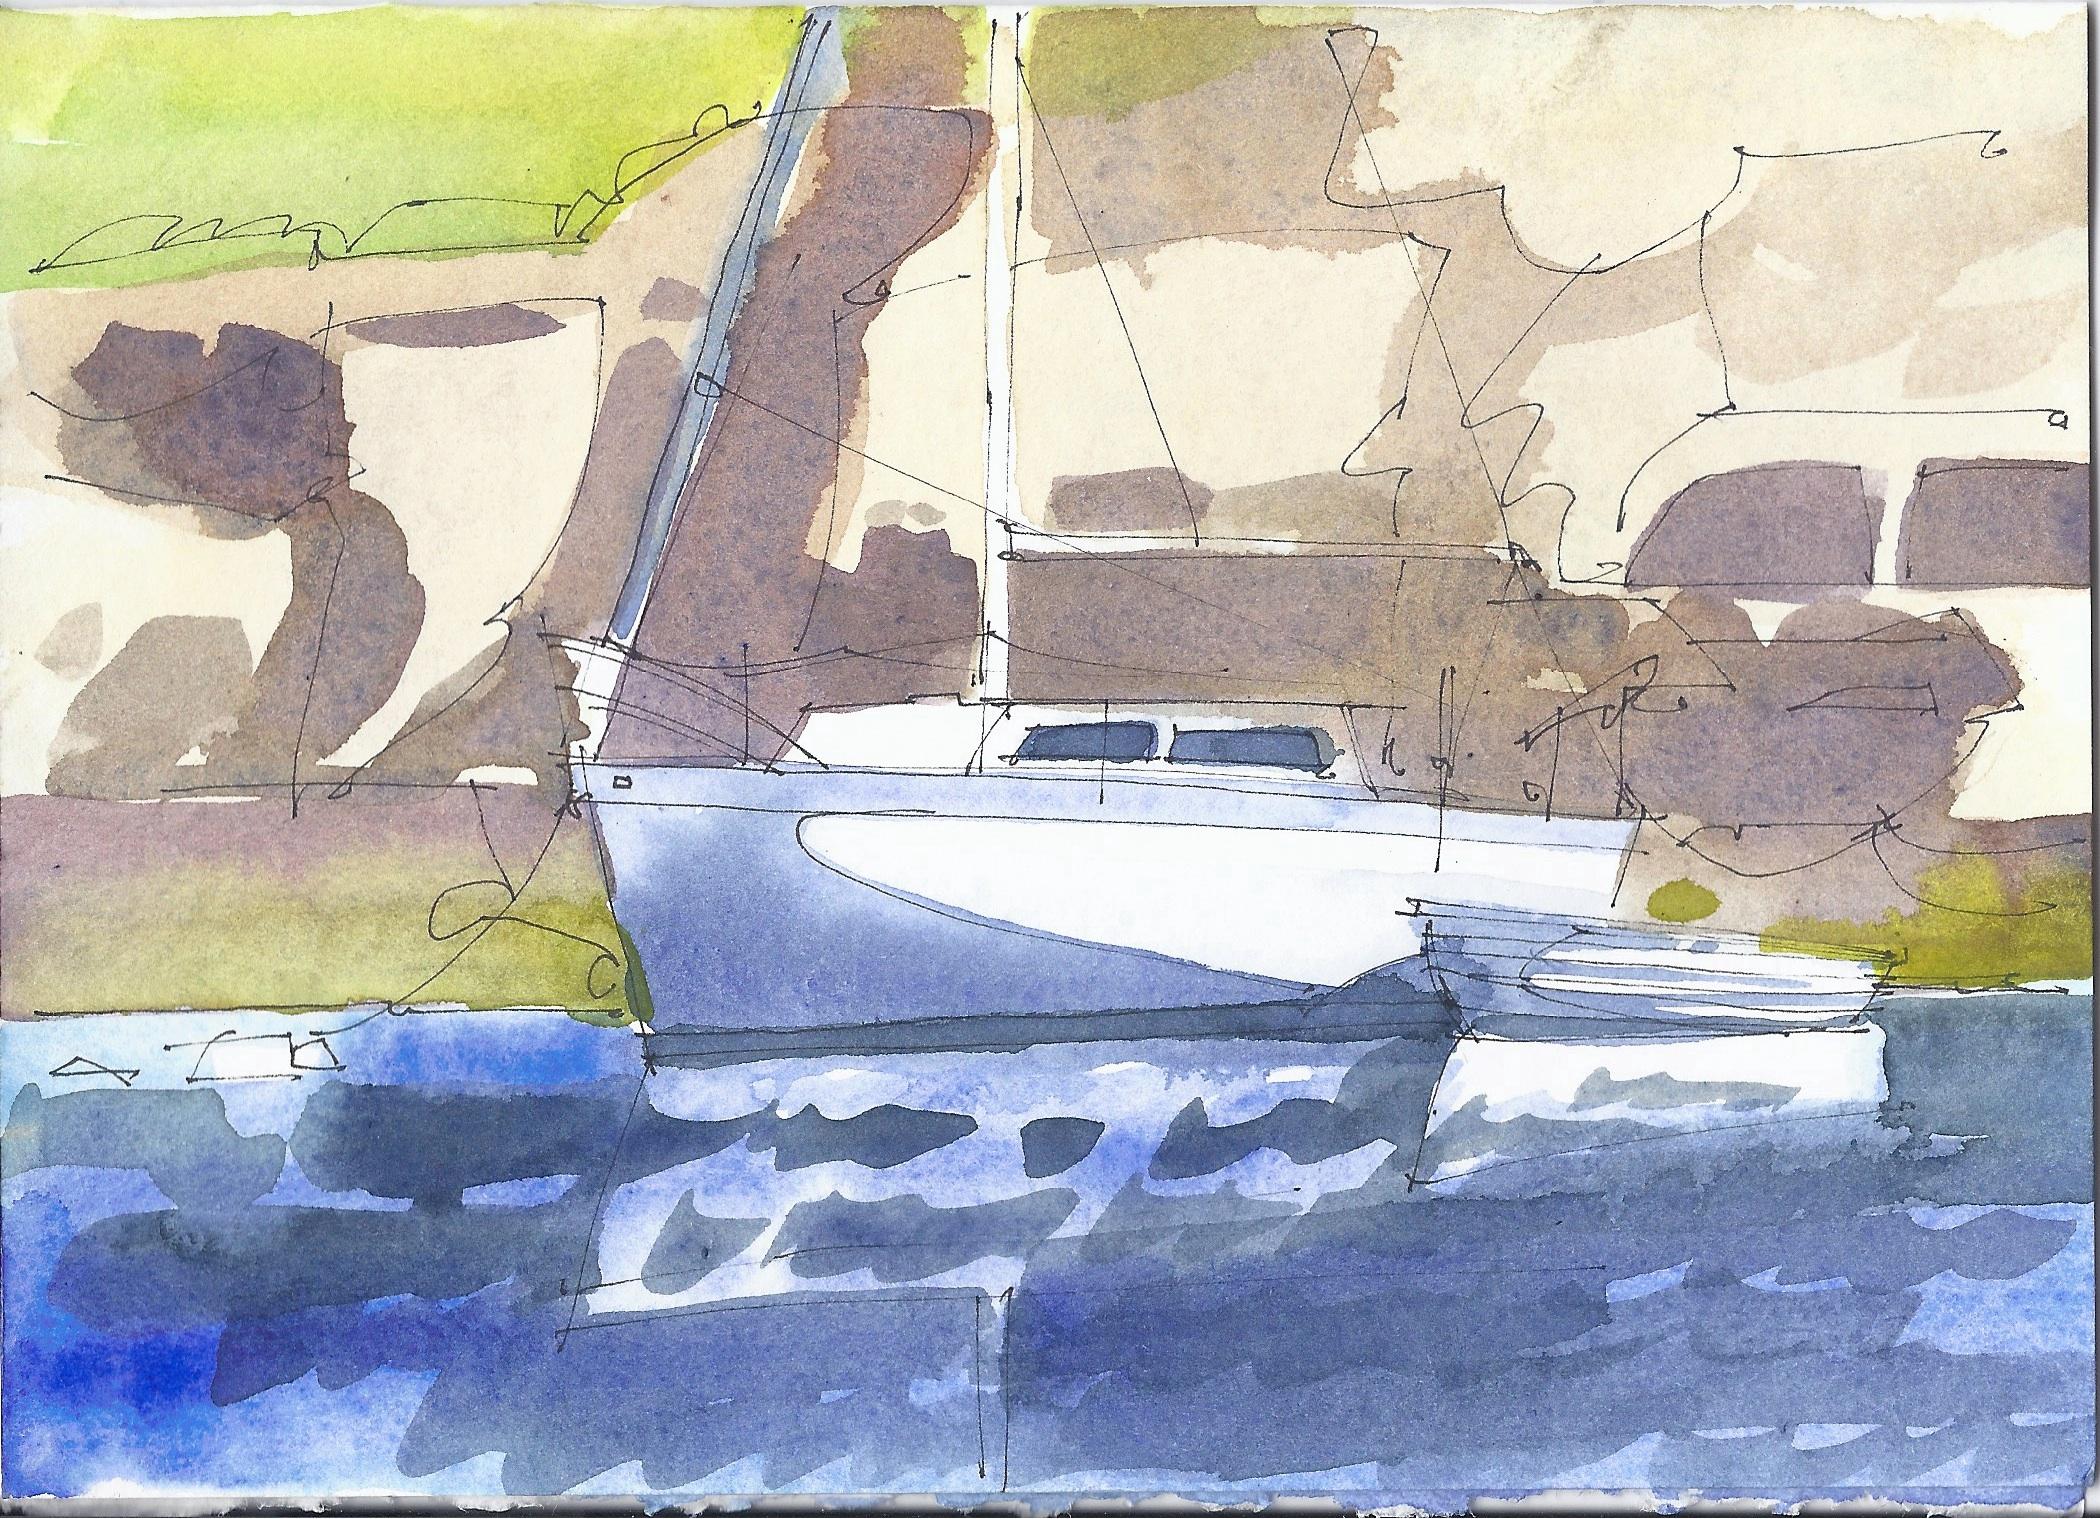 Degnen sailboat&launch-6128263759.jpg